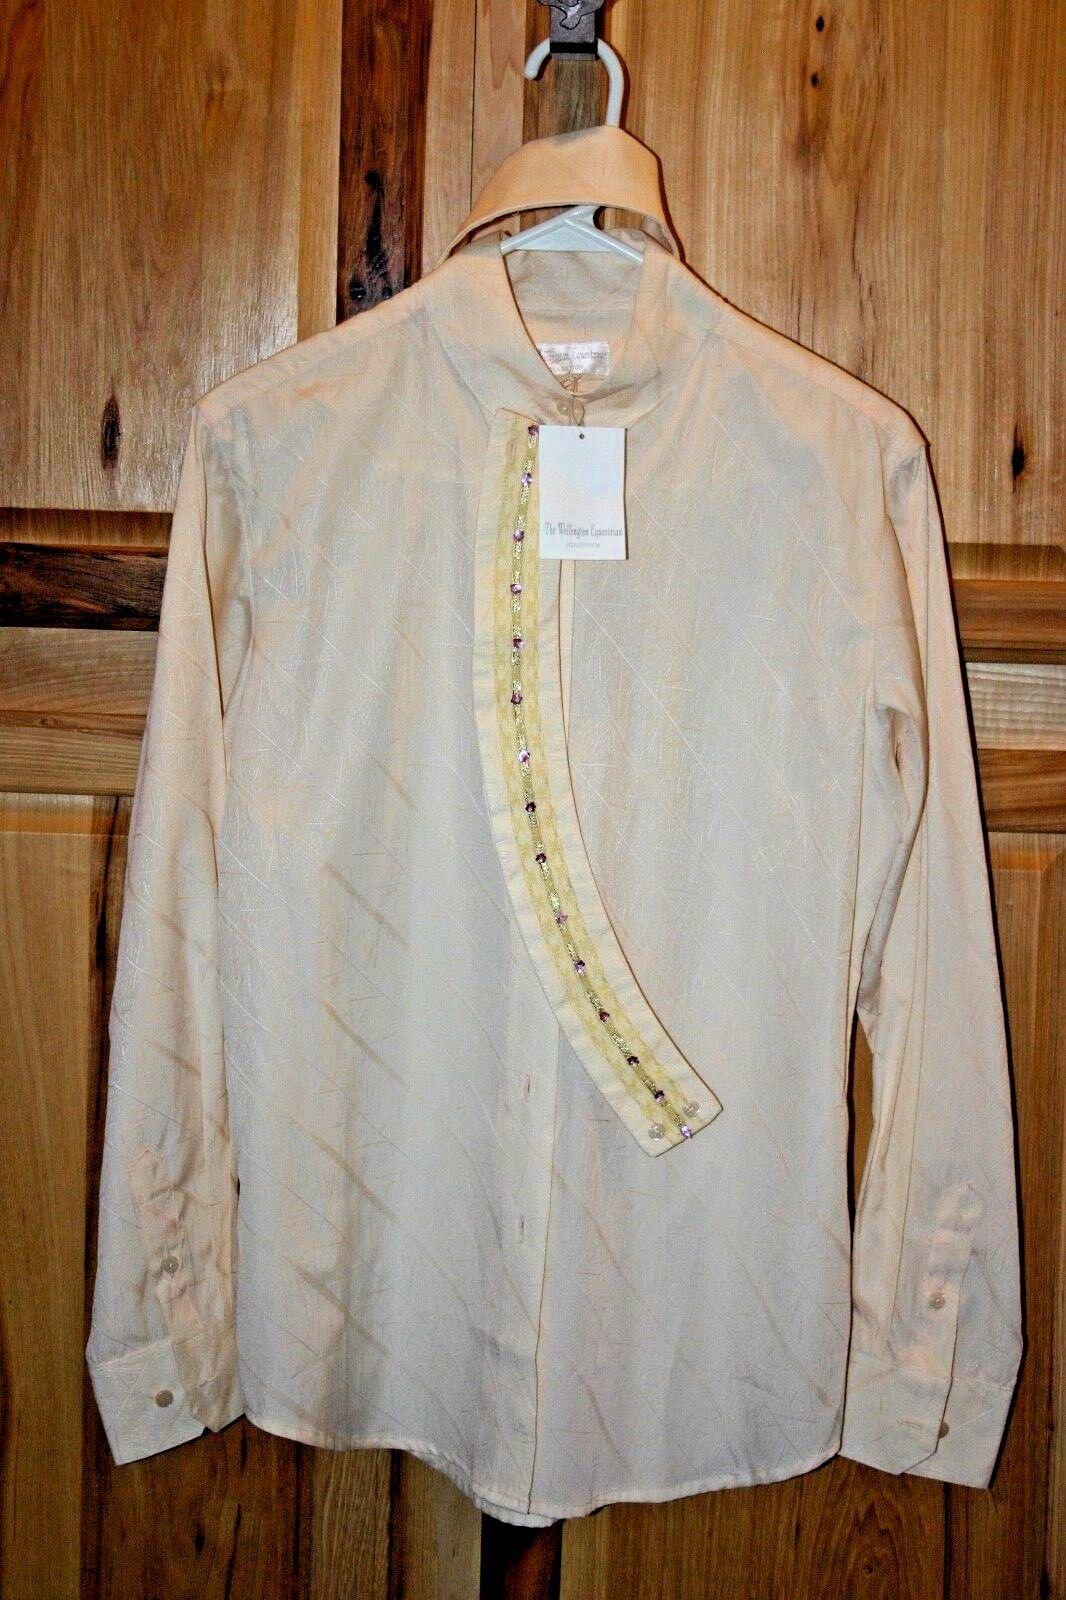 Charles Owen Wellington English Hunt Show Shirt Ladies 6 38, Cream, NEW & Fancy